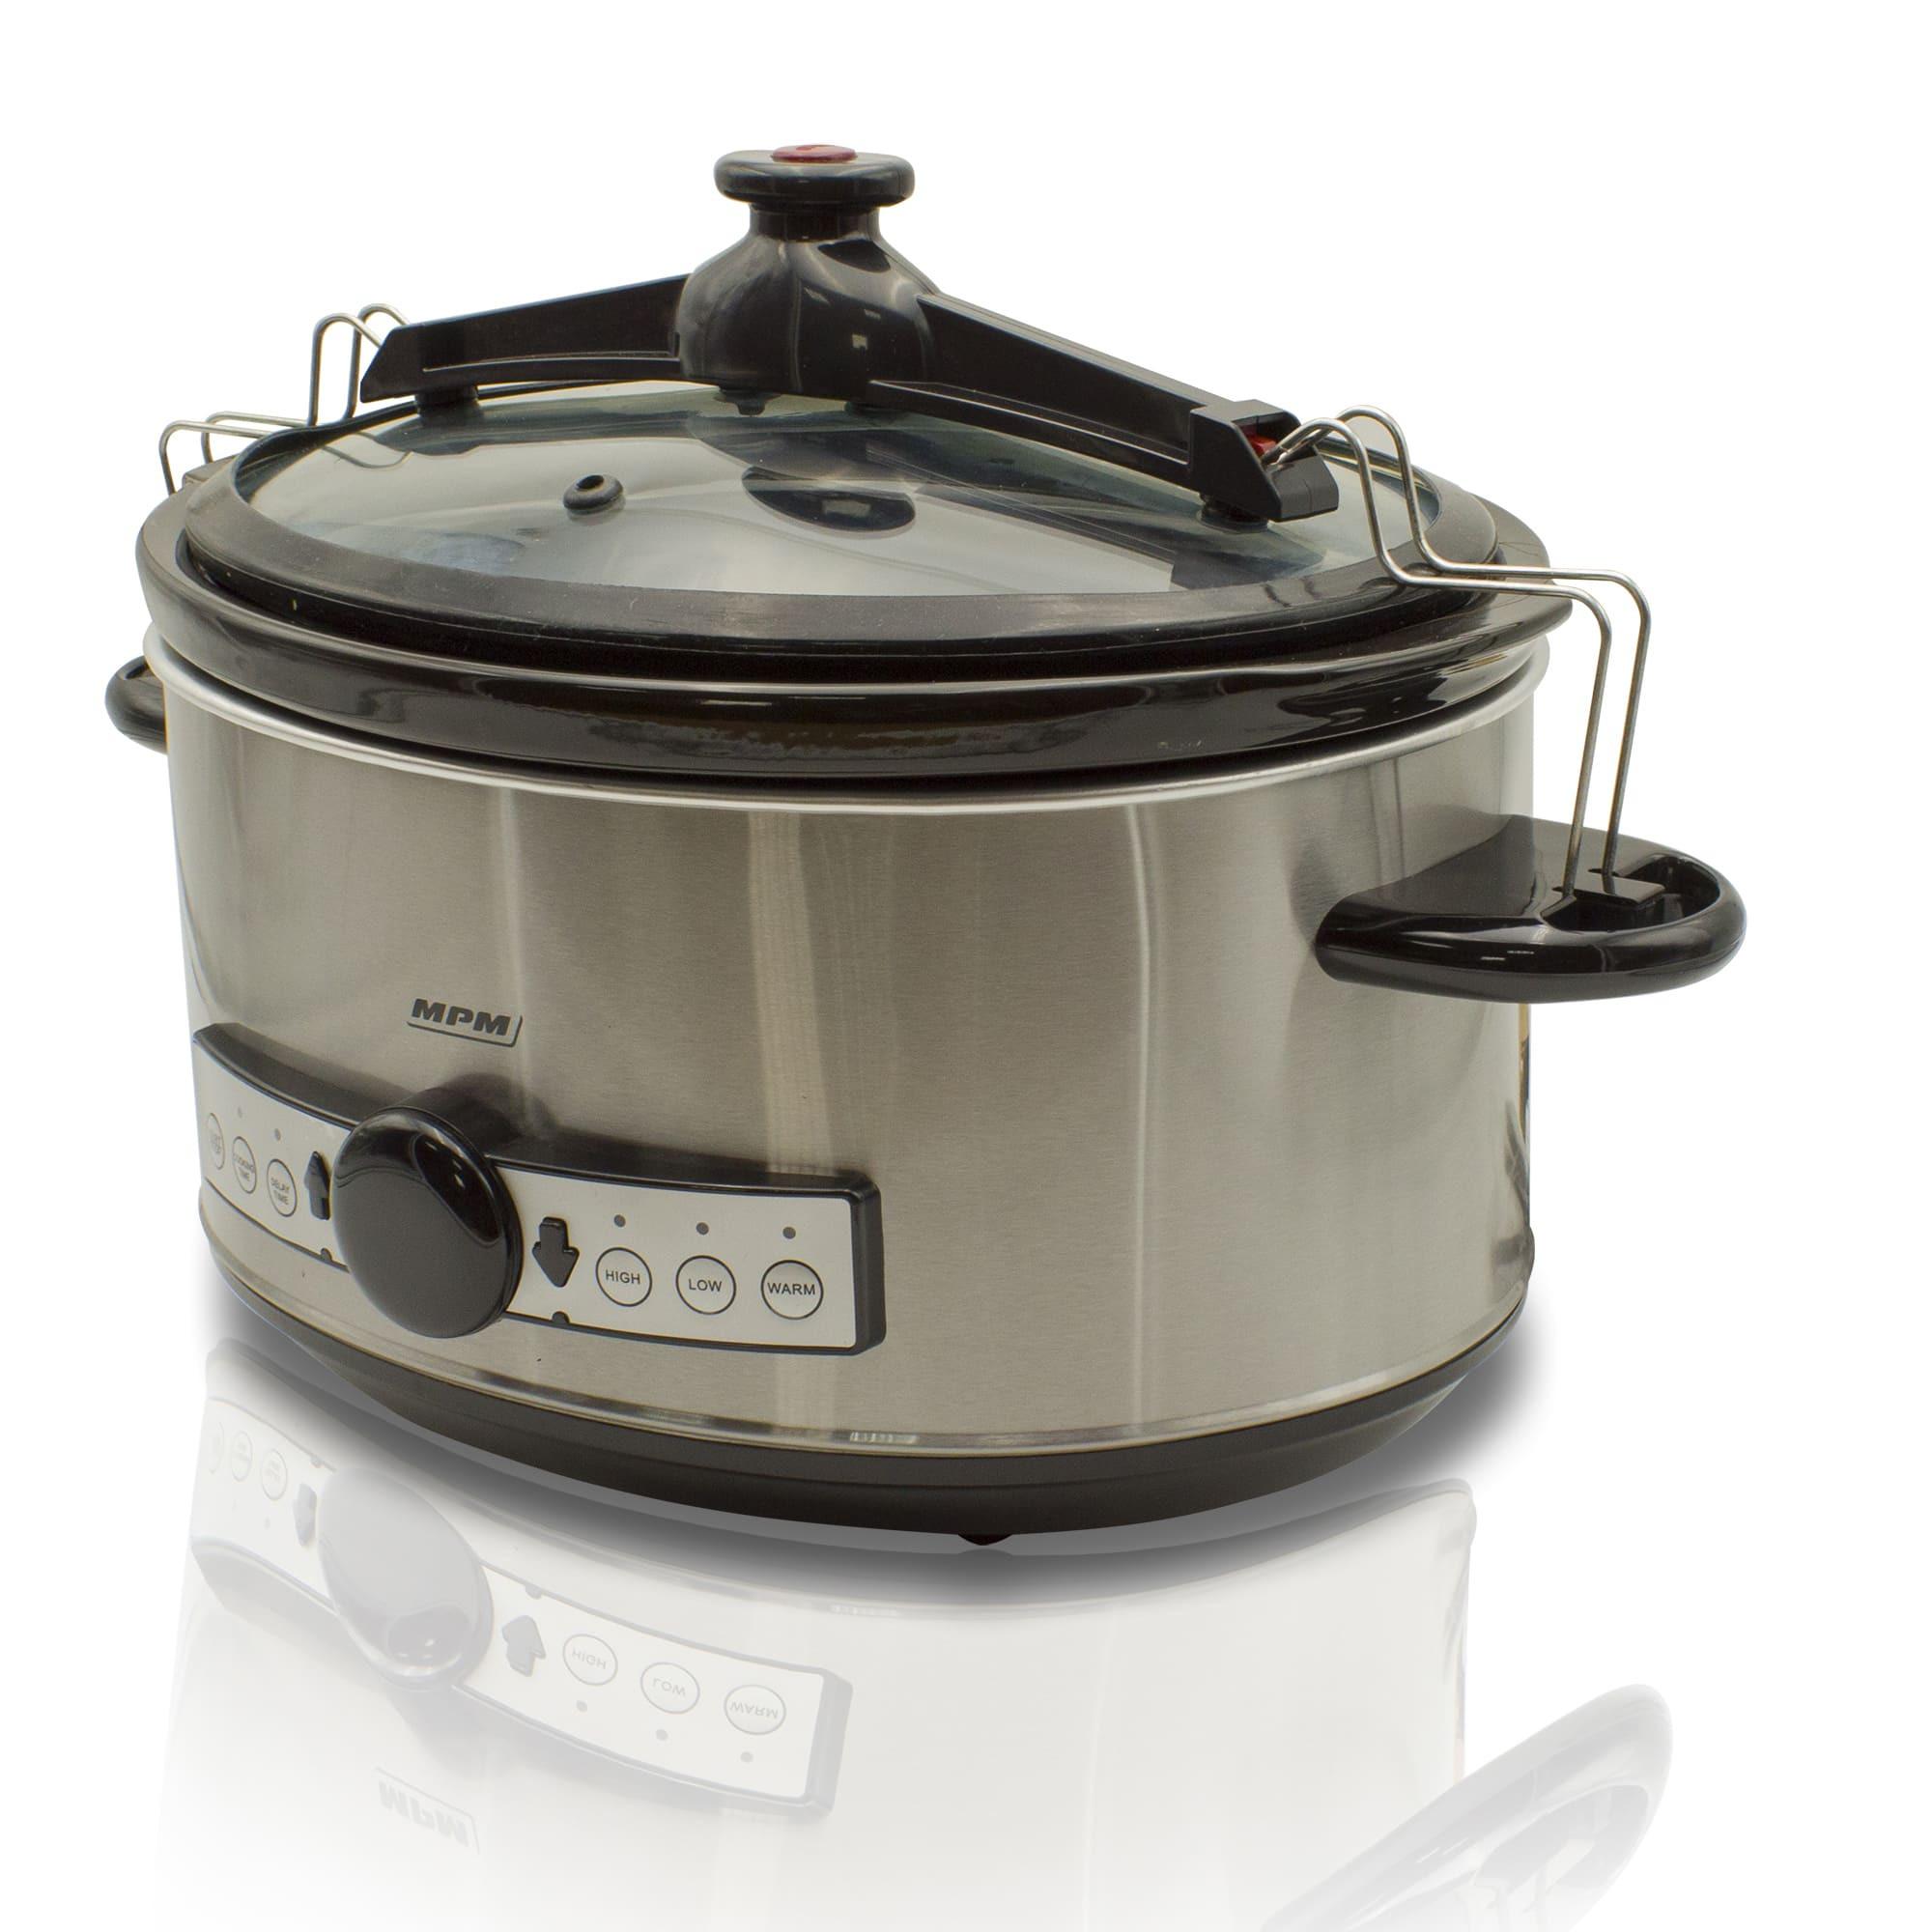 MPM MWO-01M Olla cocción lenta programable 6,5 litros, cubeta cerámica ovalada libre PFOA y PTFE, 3 niveles temperatura, tapa cristal, Slow Cooker acero inoxidable